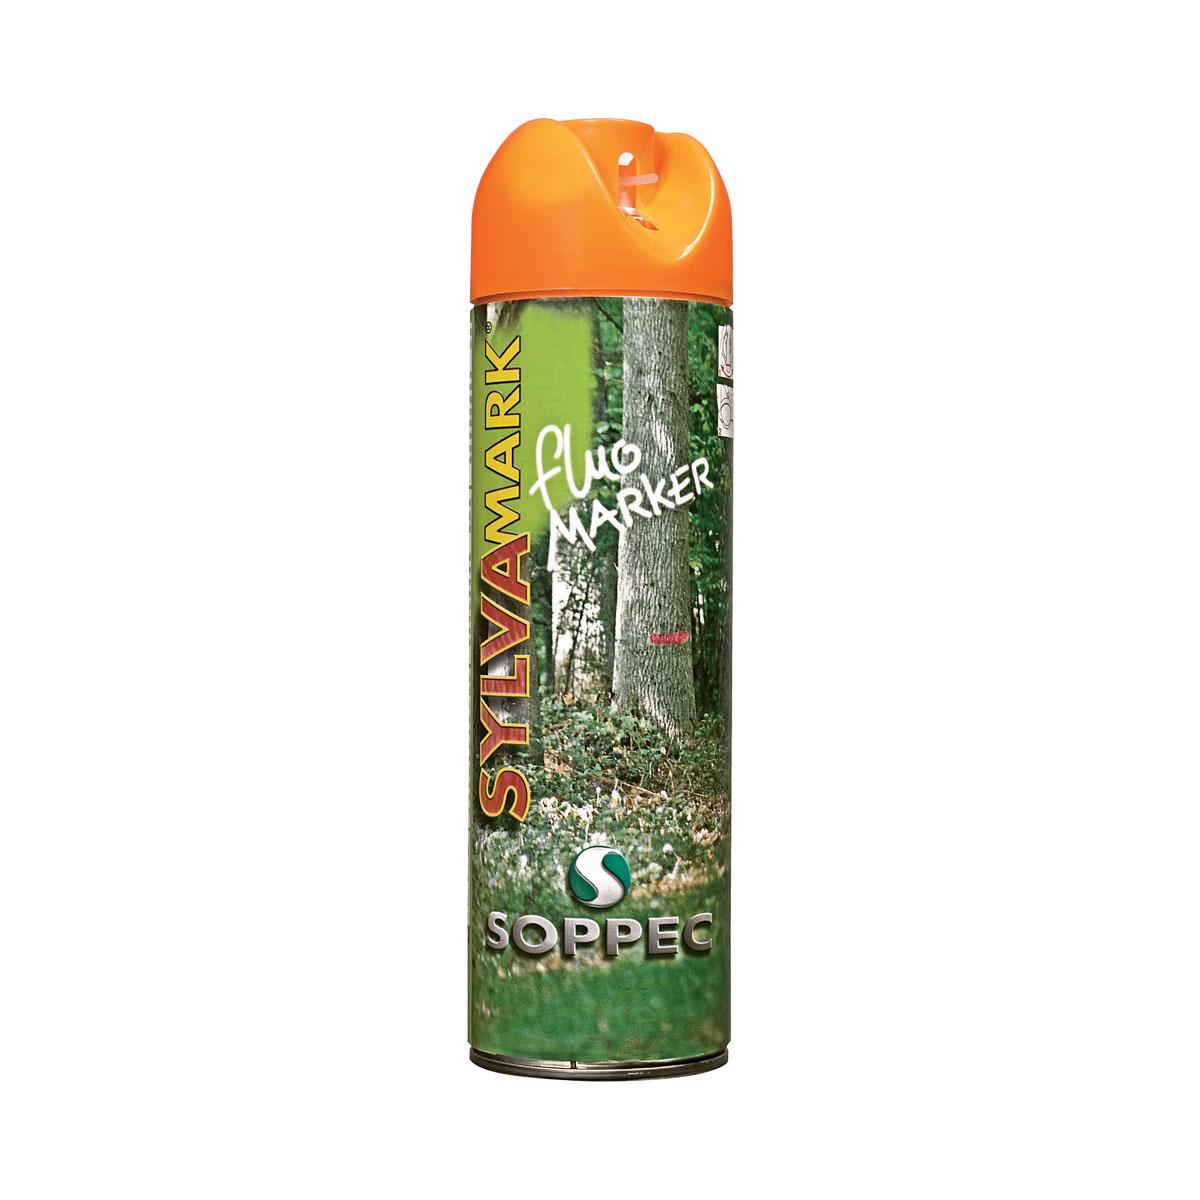 Aérosol traceur forestier, orange fluo, 500 ml